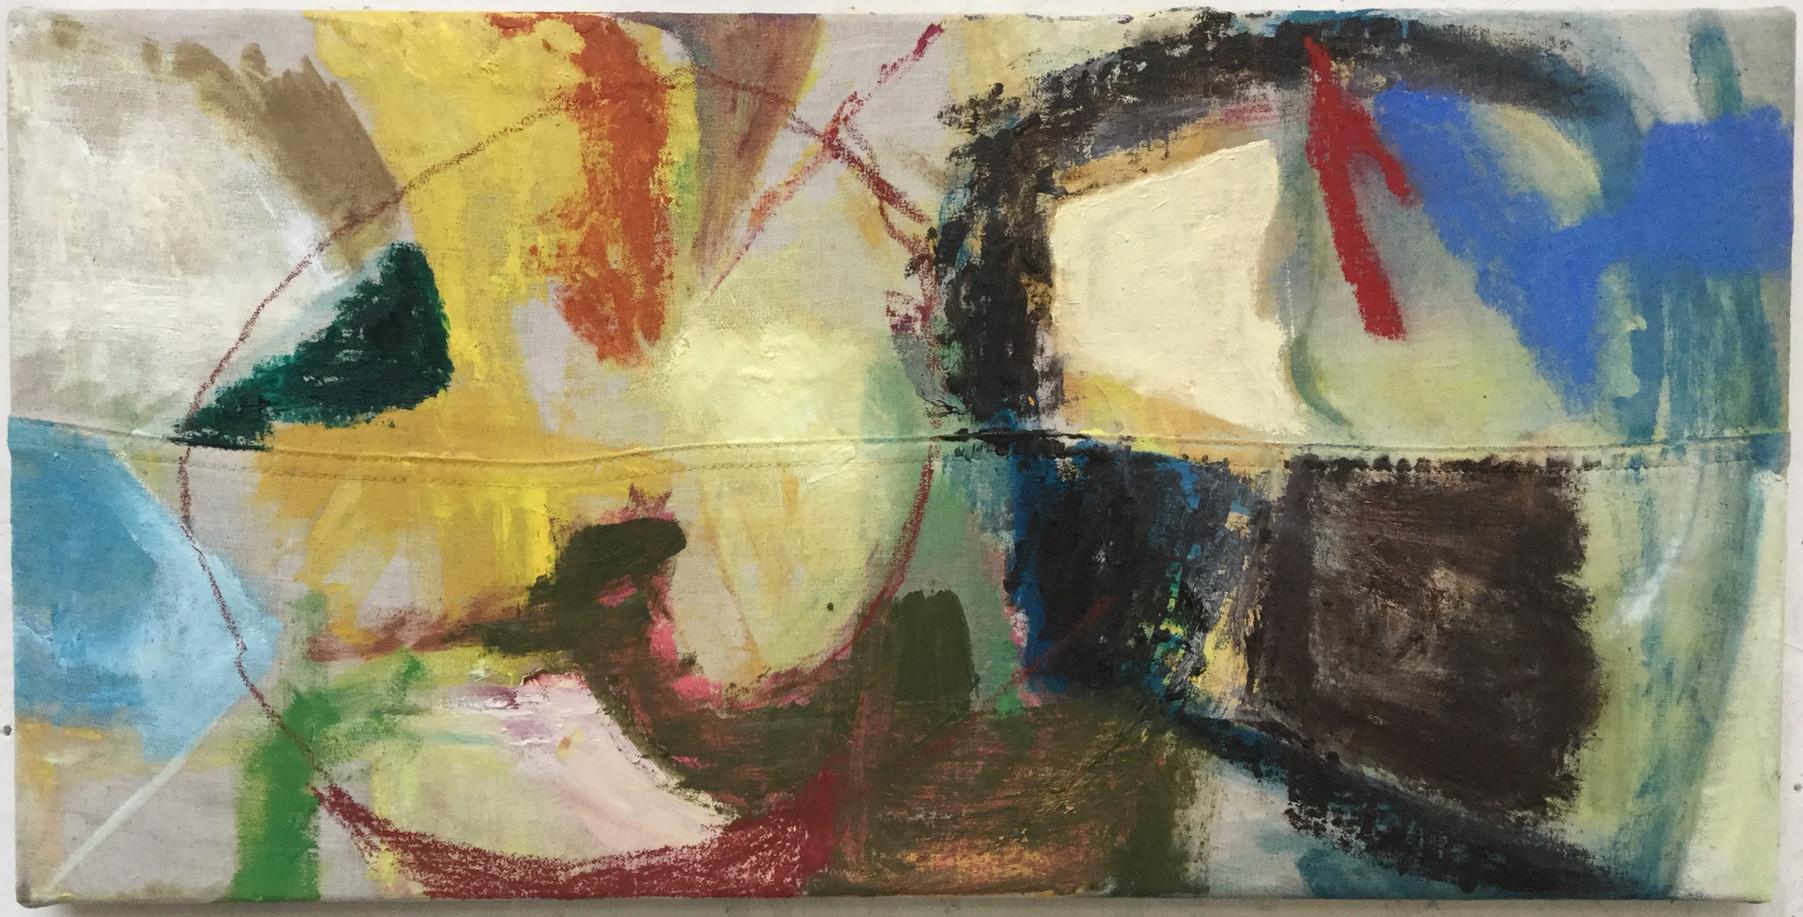 H.F. van Steensel - A journey to Ireland